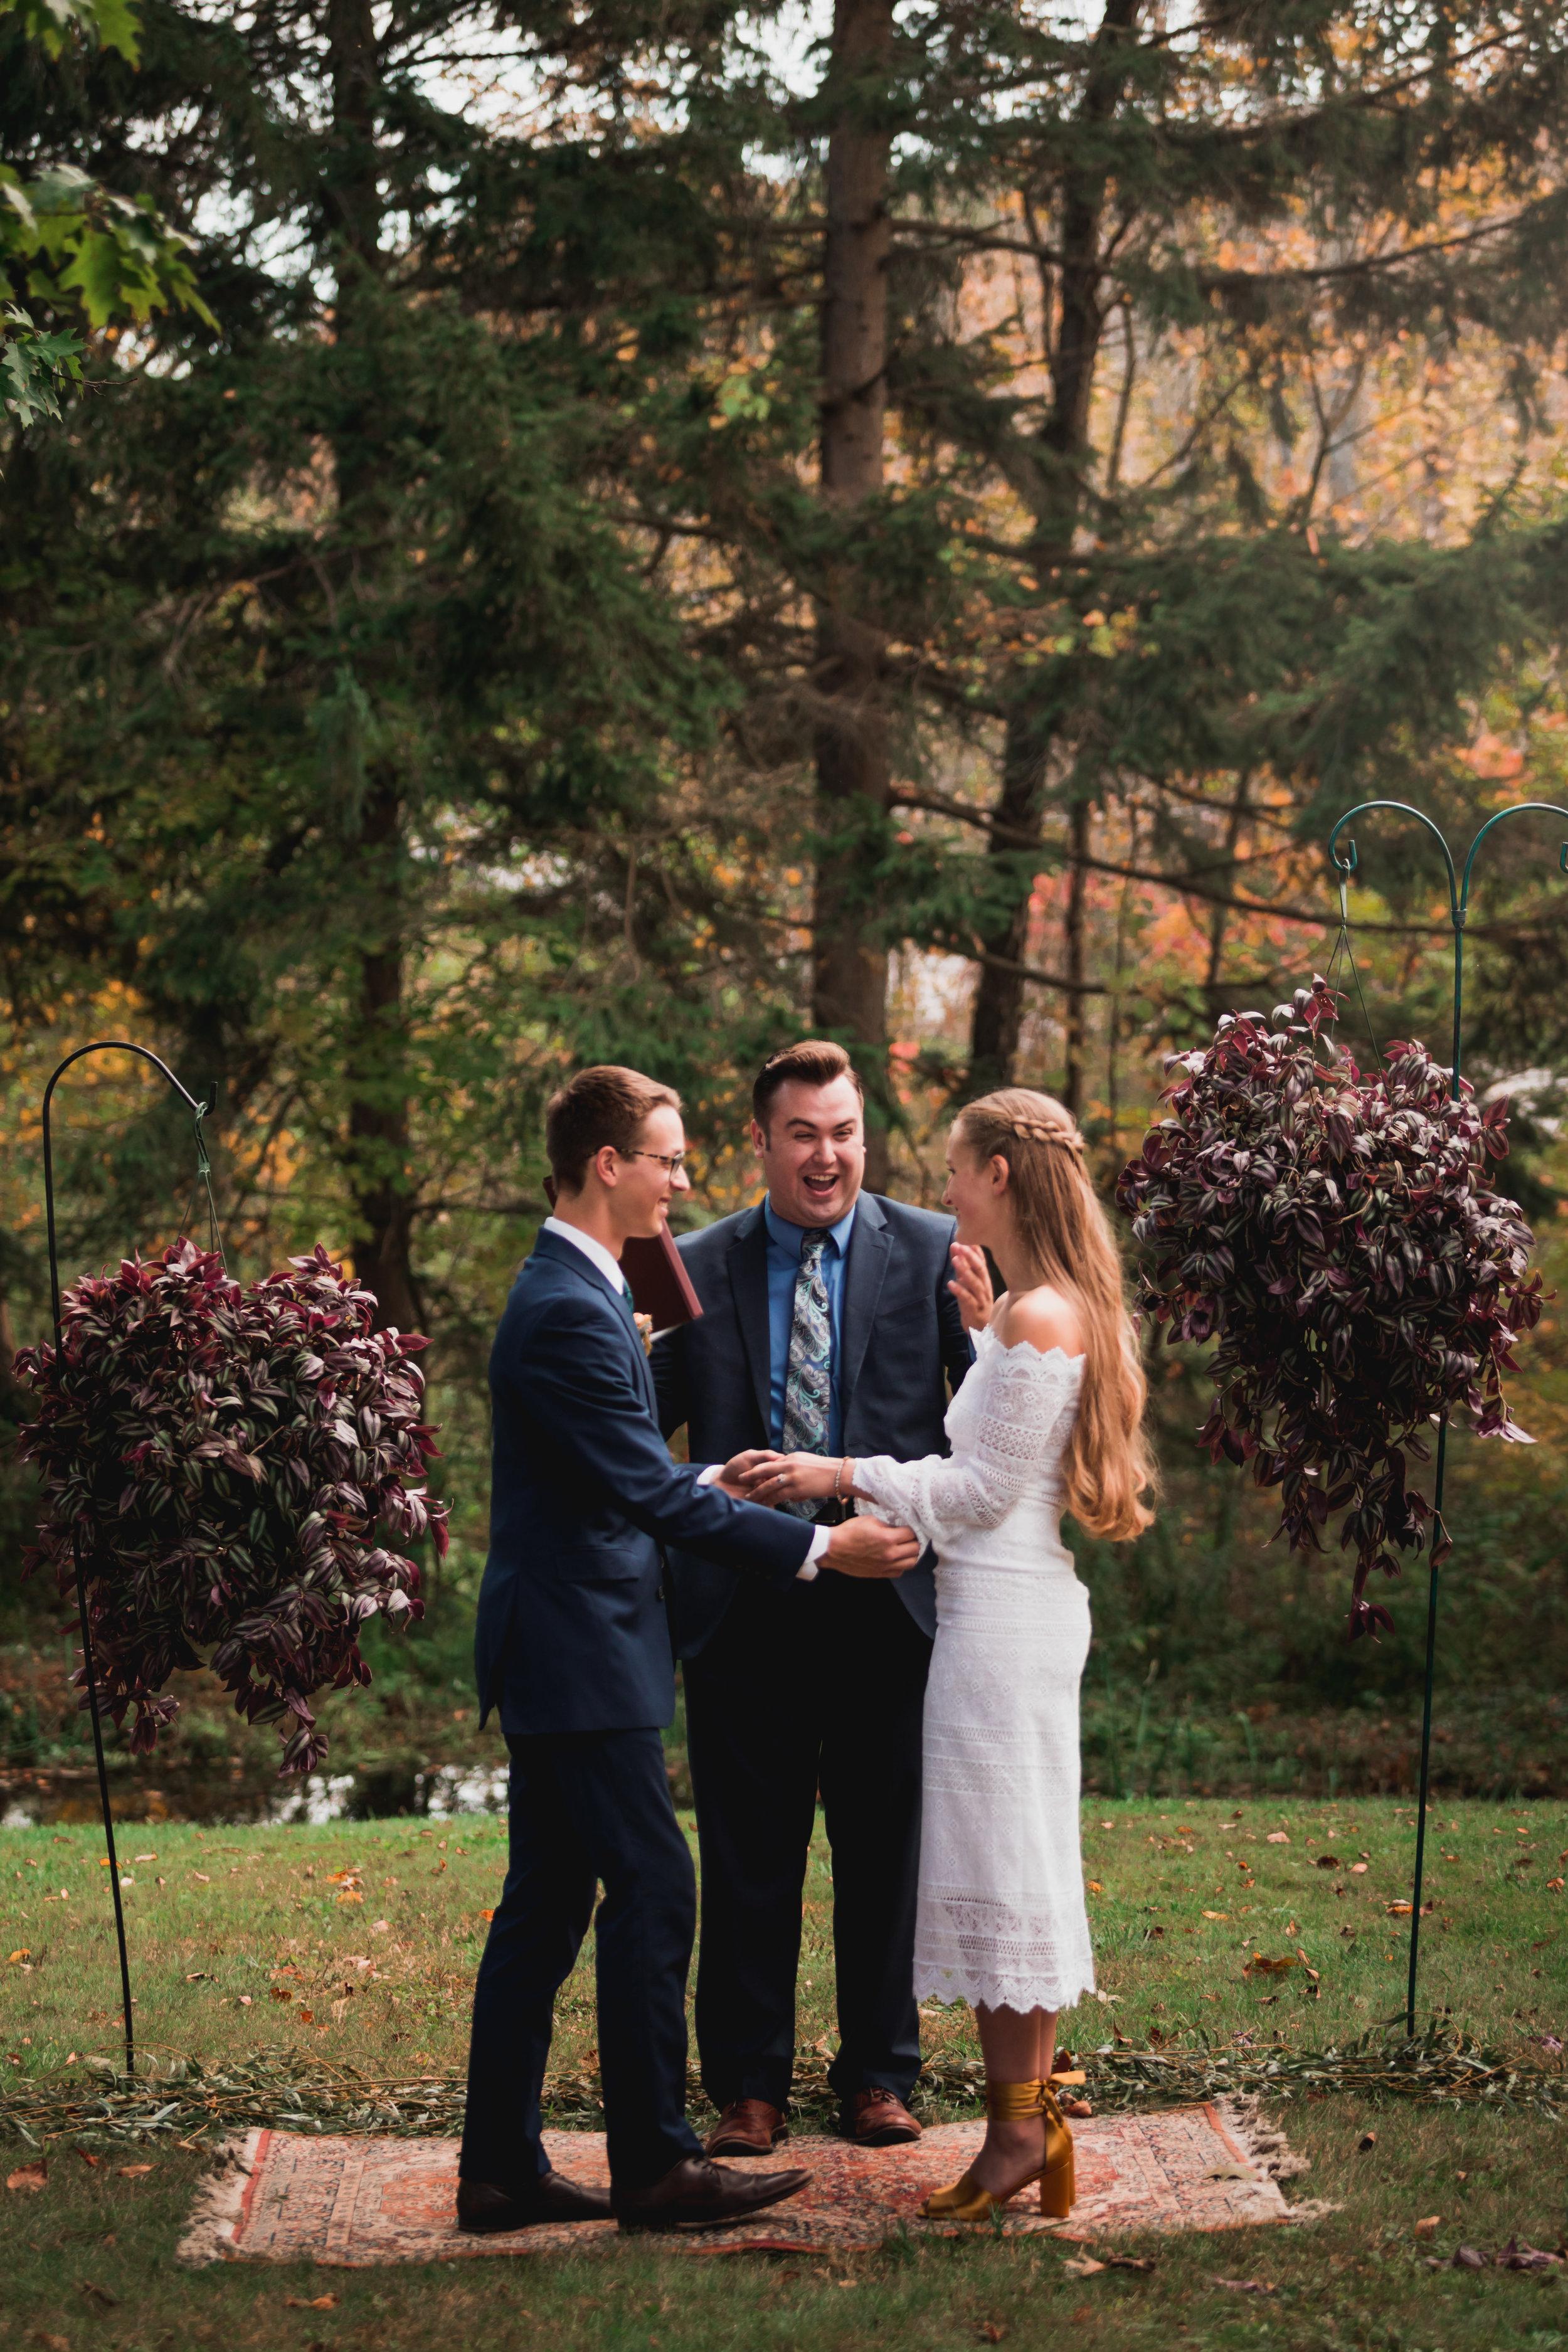 vild-photography-photographer-tahoe-intimate-wedding-adventure-van-abigail-47.jpg